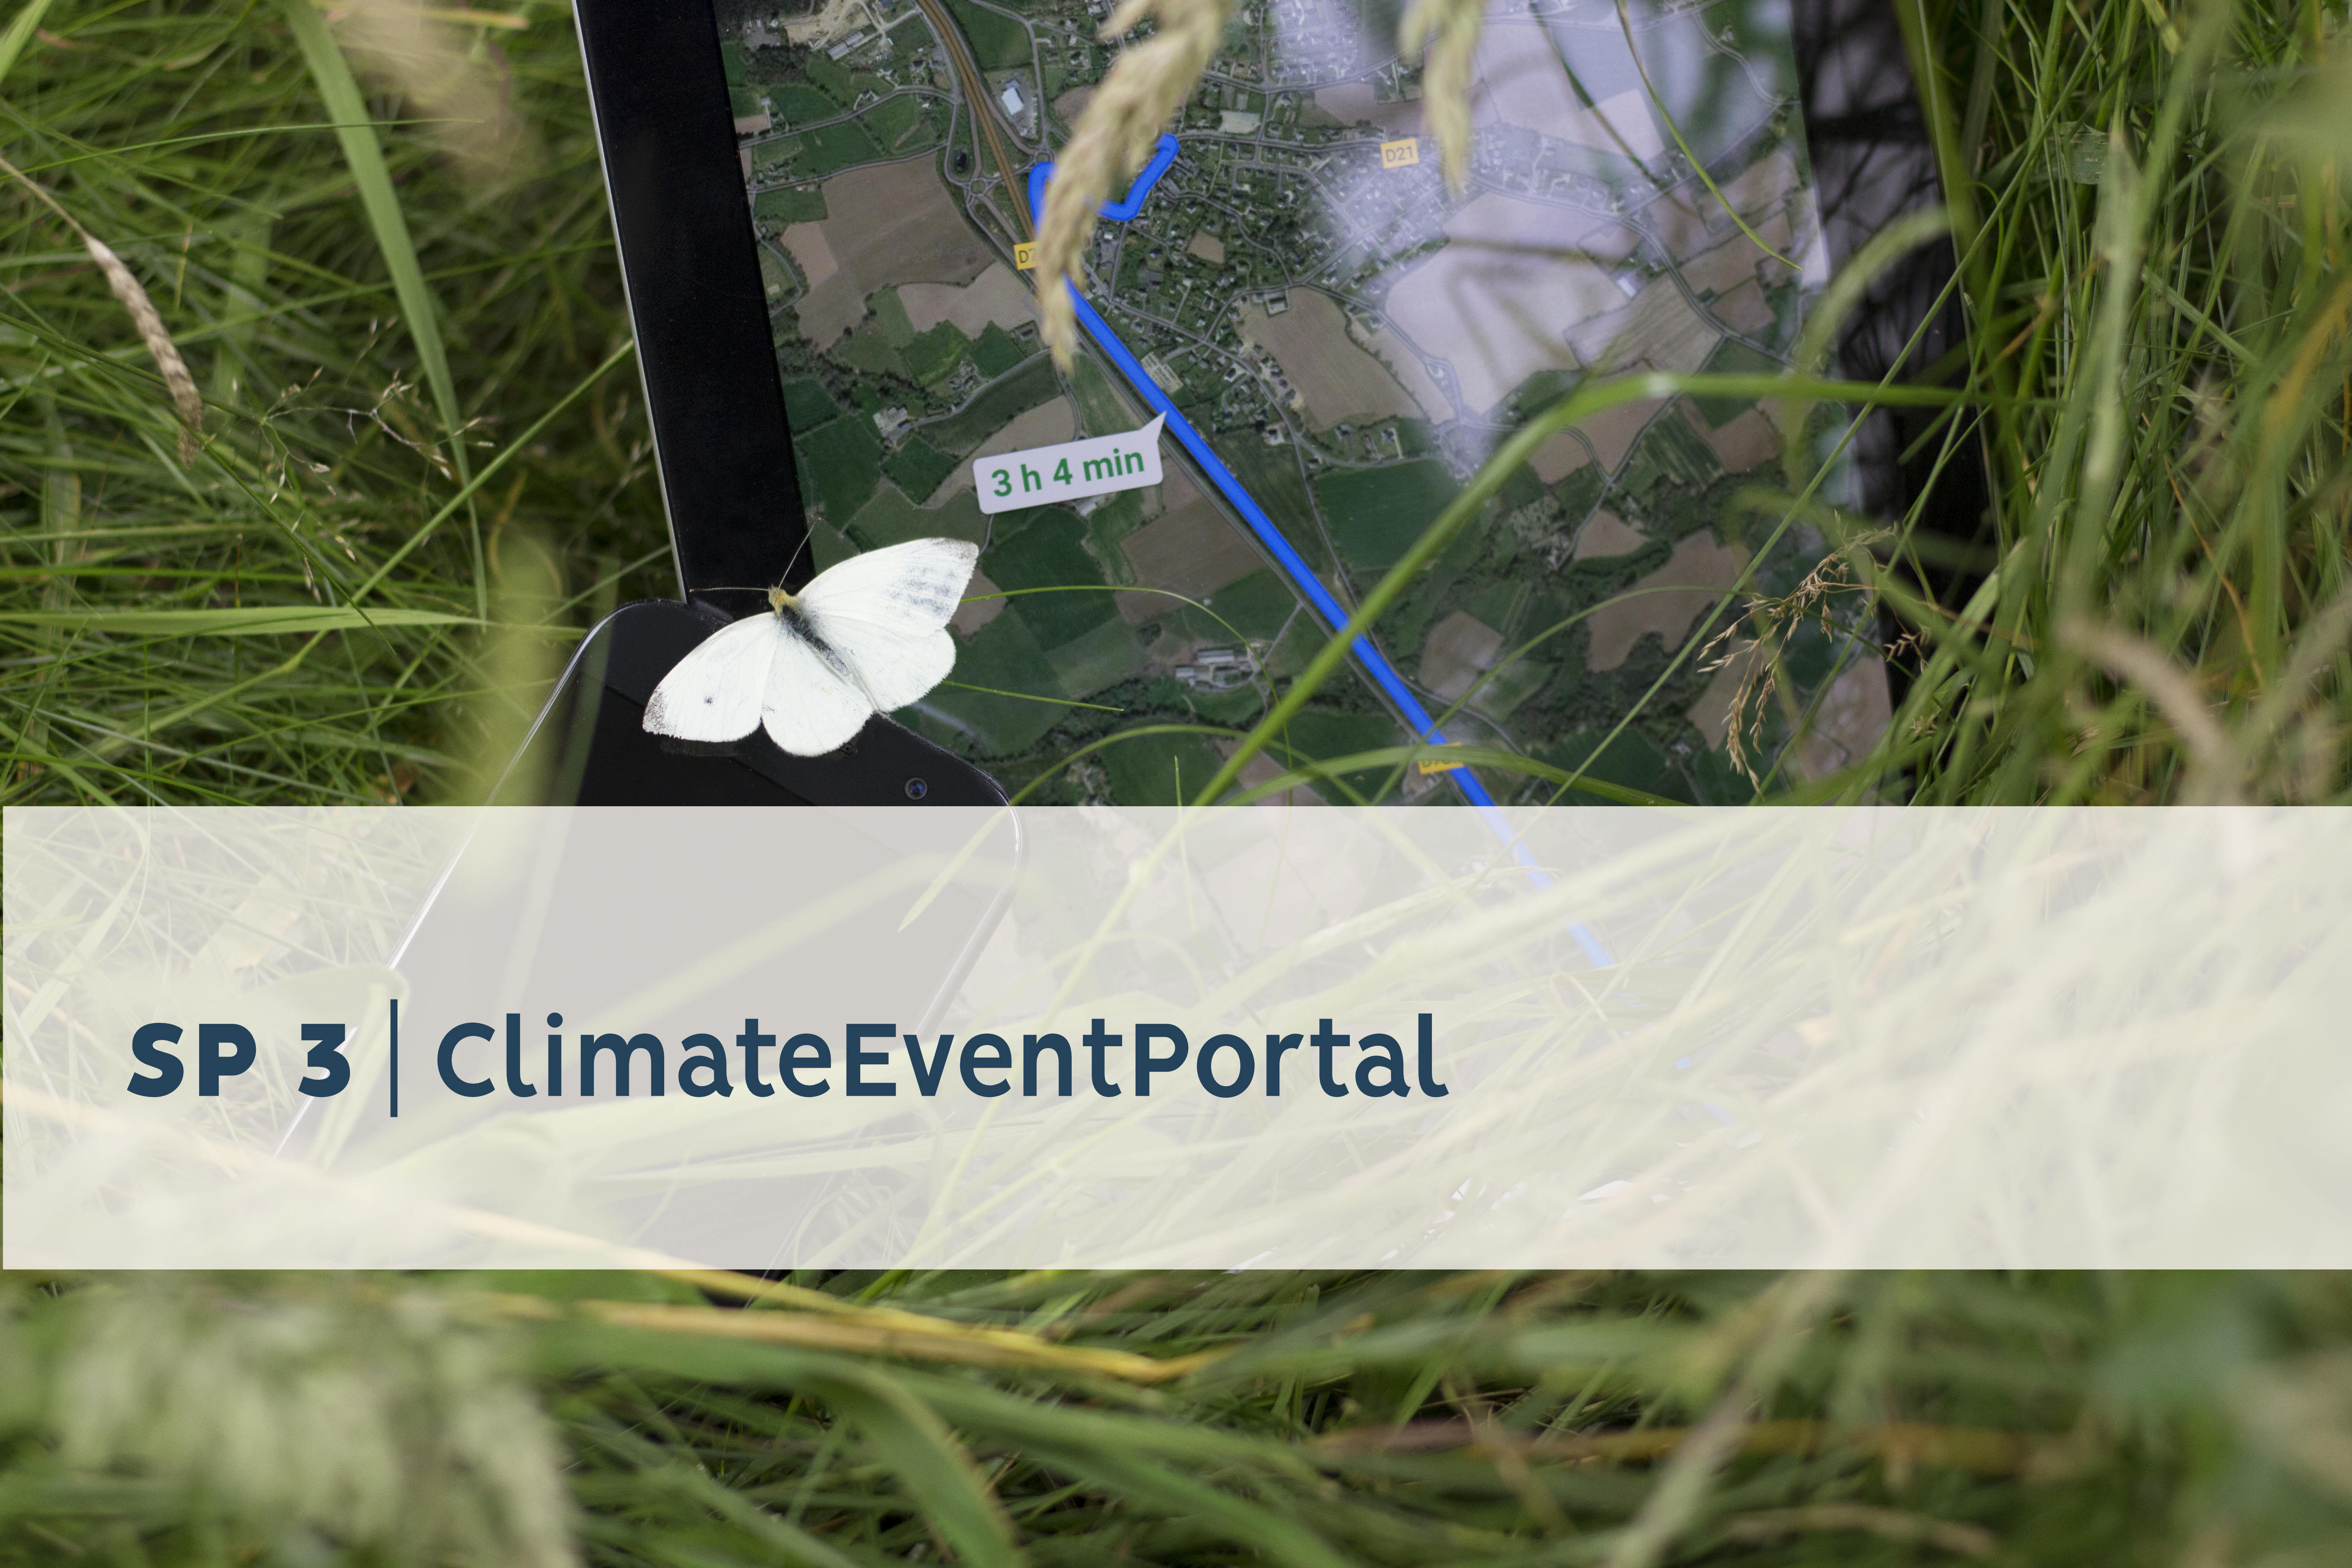 KlimaEventPortal